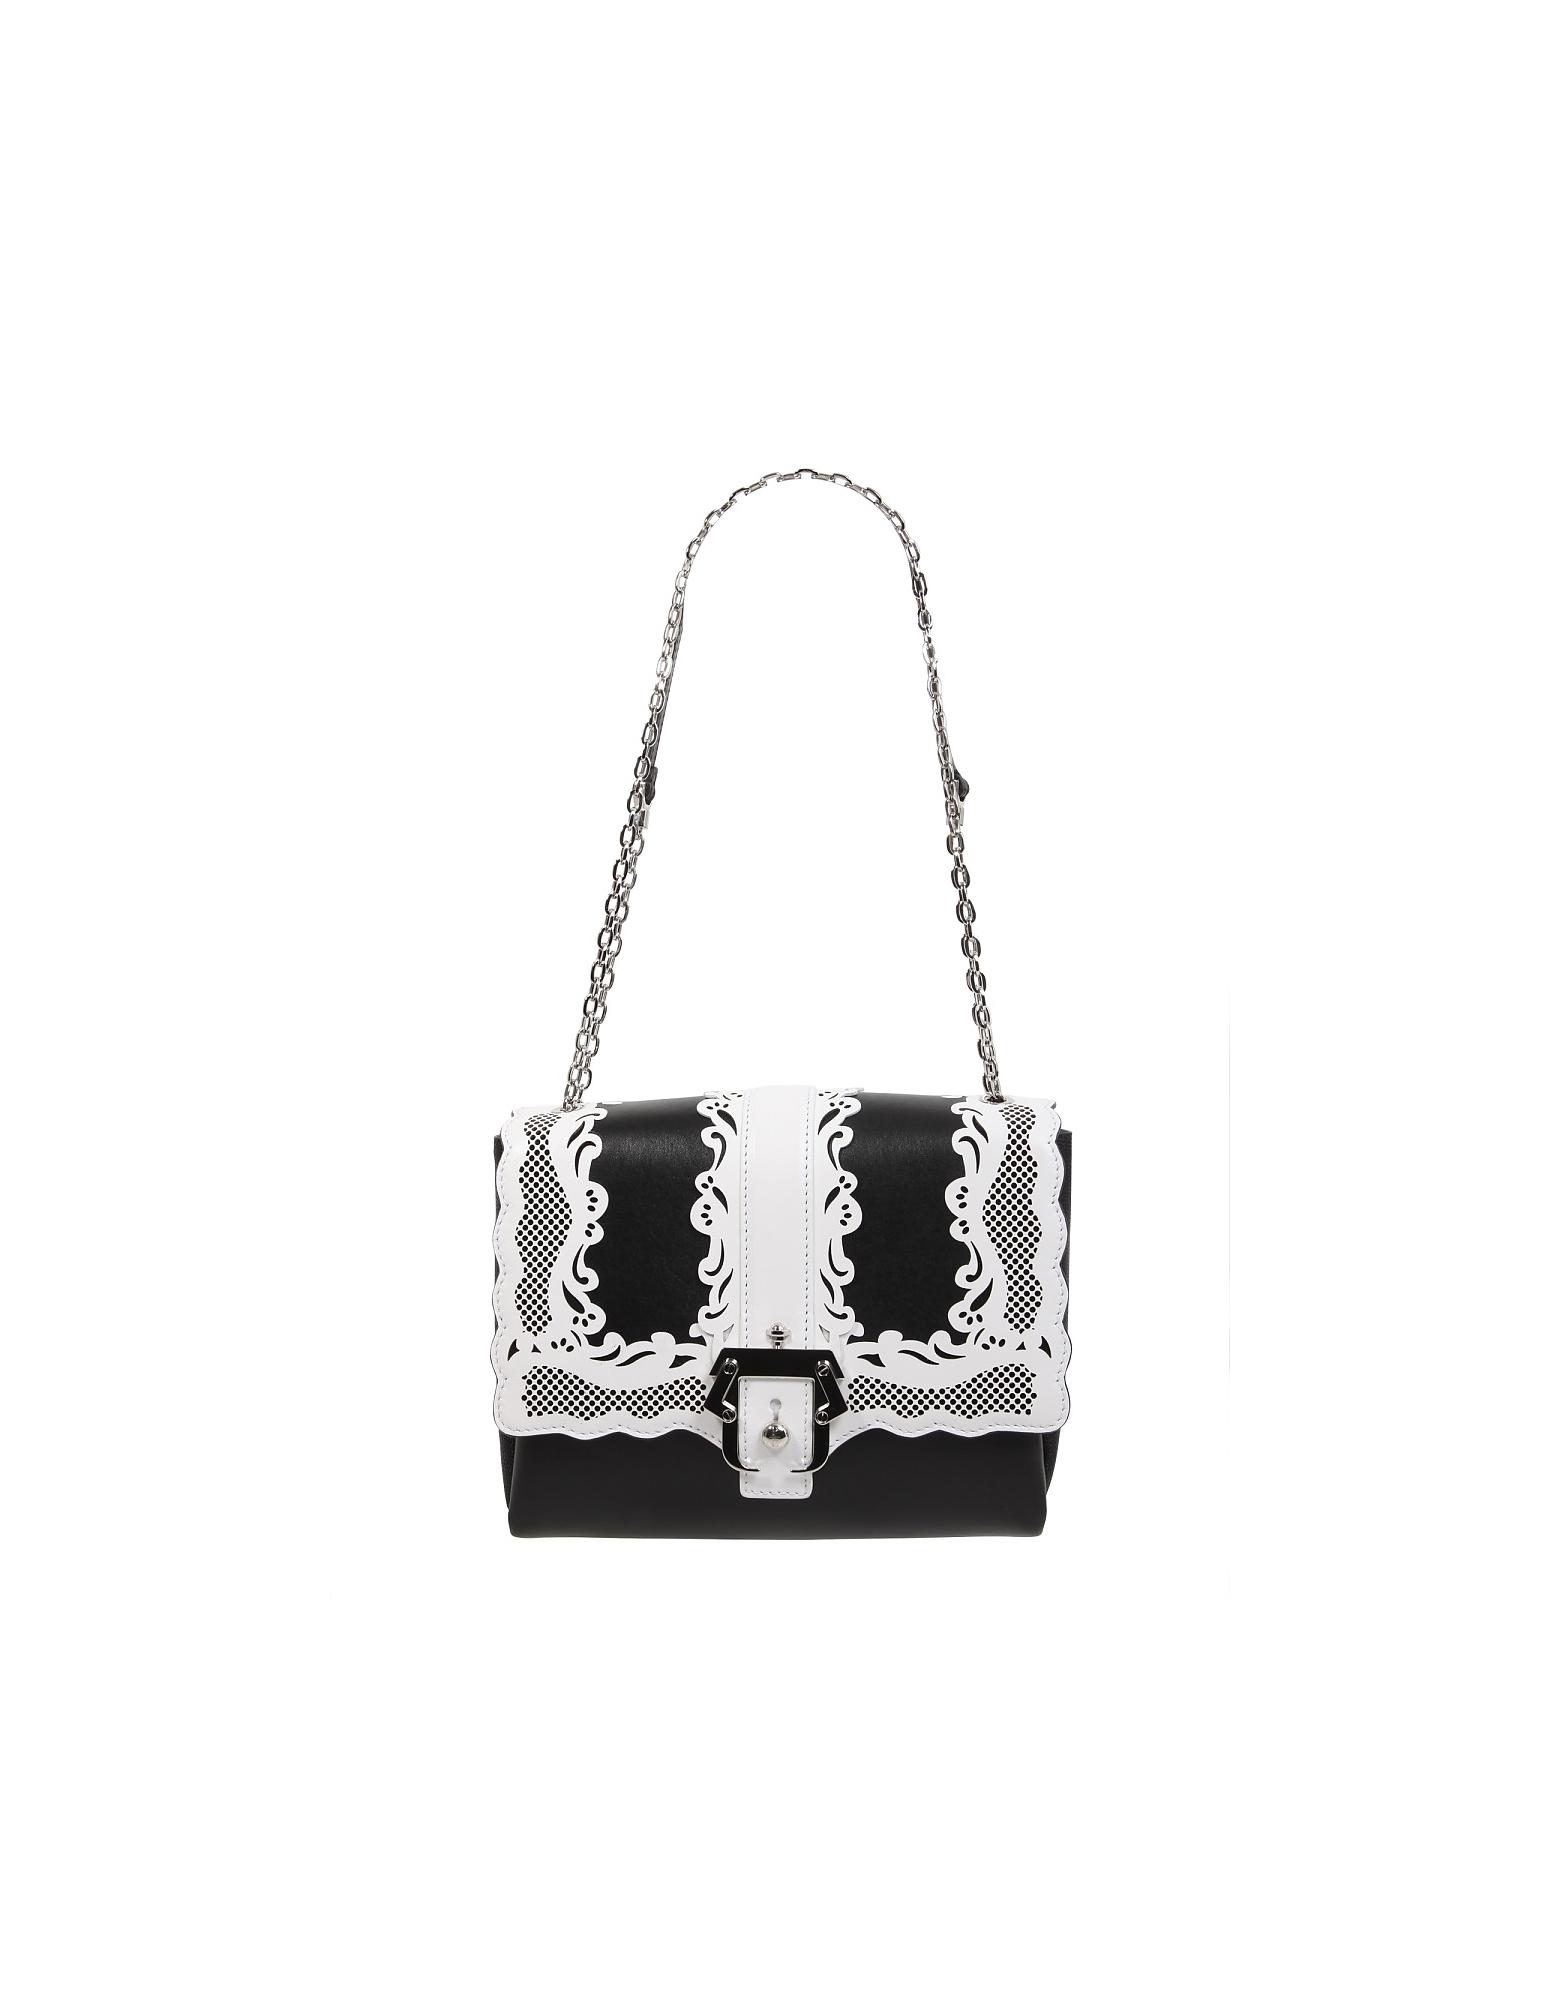 Paula Cademartori Designer Handbags, Alice Crossbody Bag